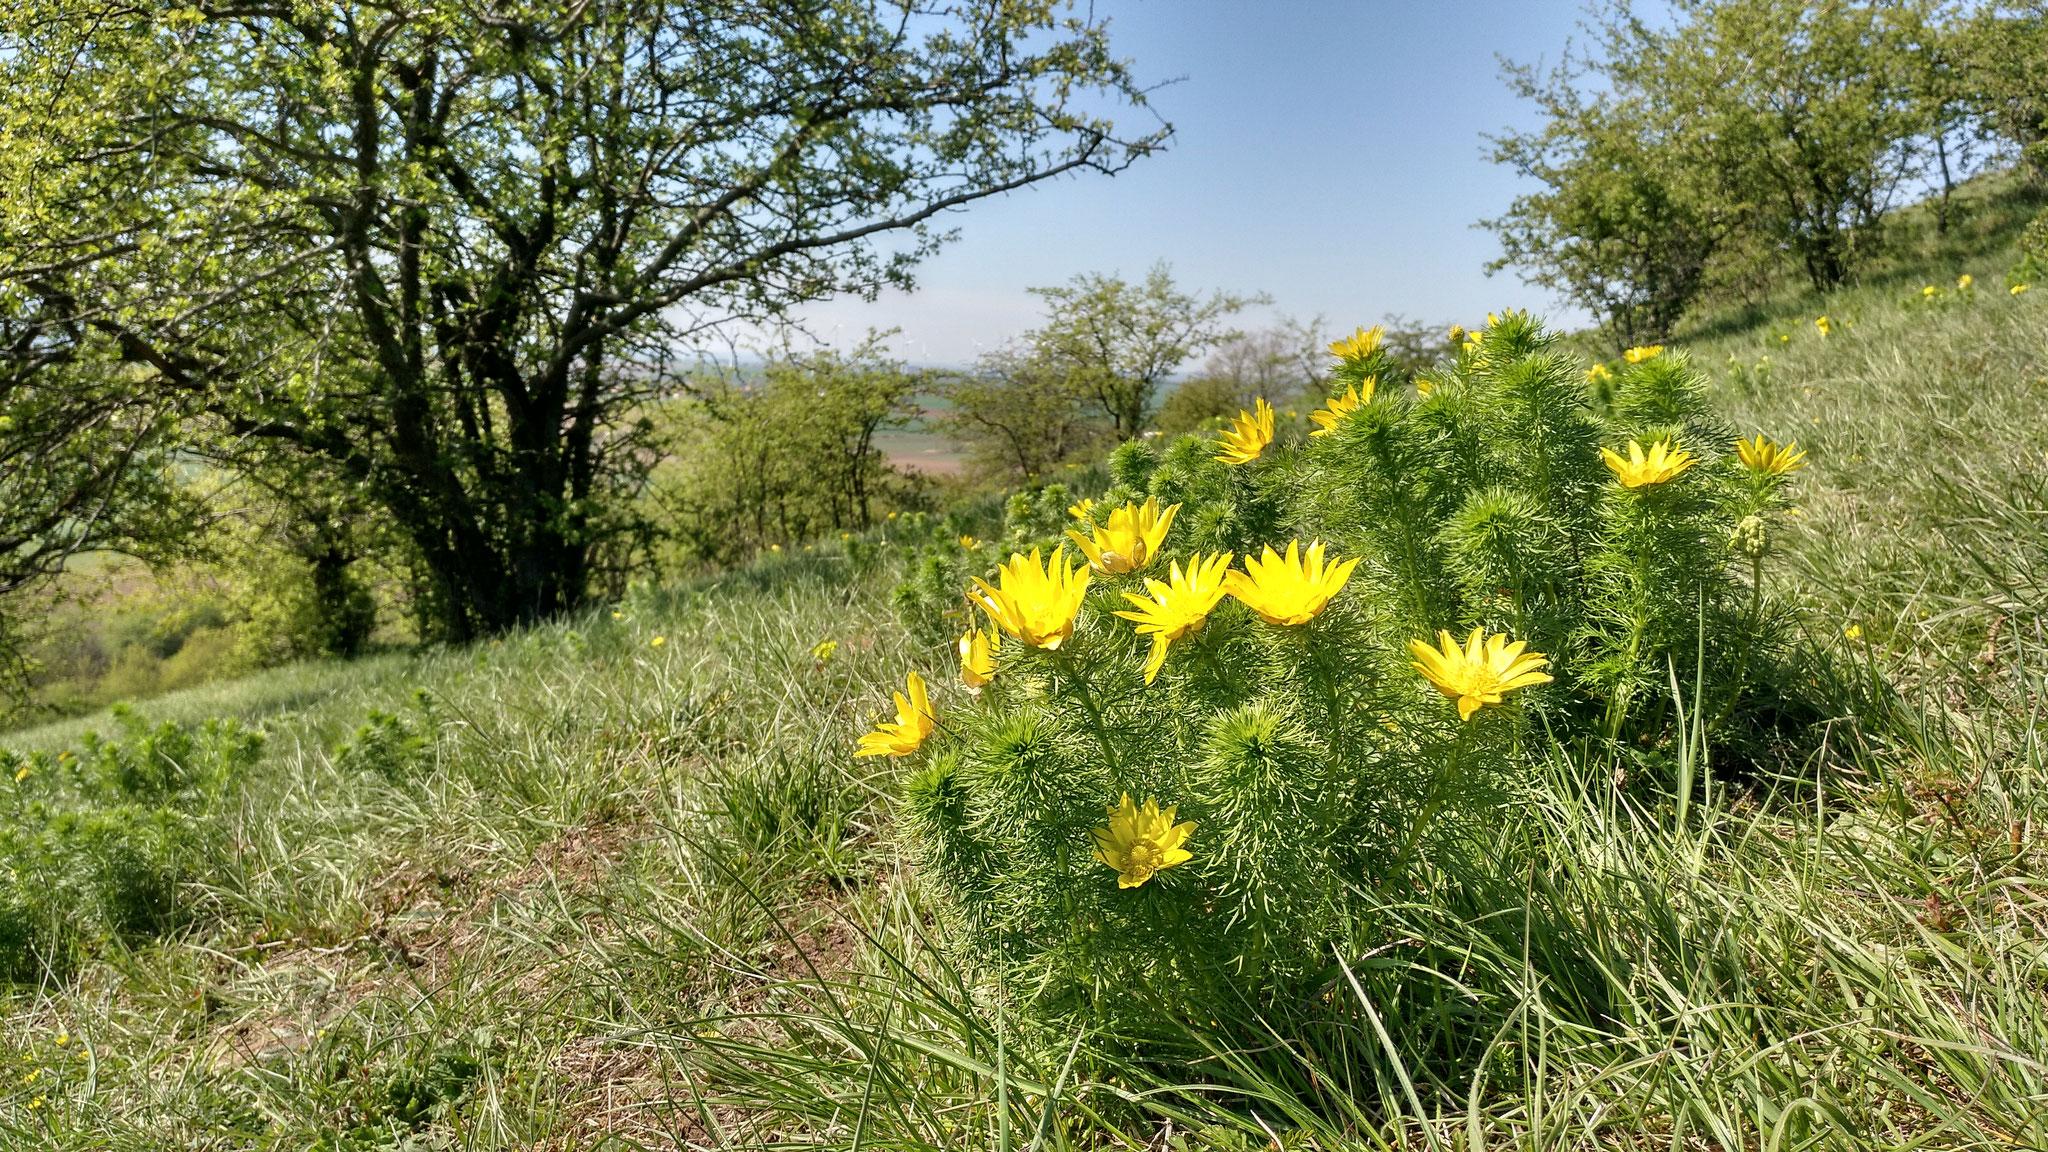 Frühling auf dem Heeseberg - Adonisröschen. Foto: ÖNSA/N. Feige